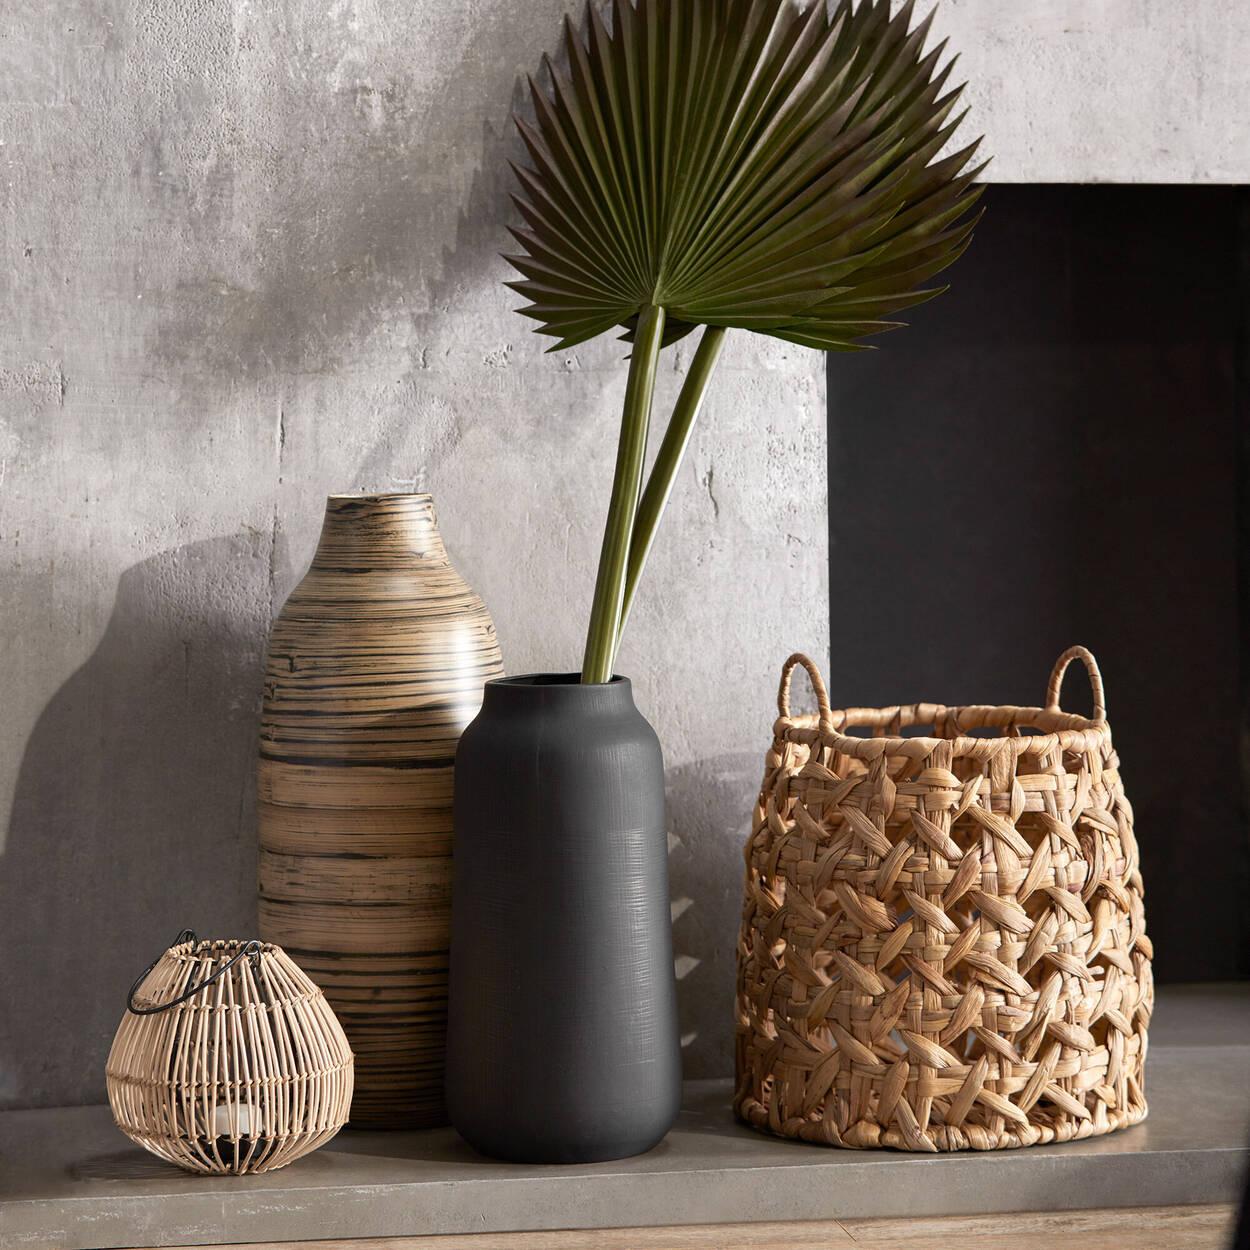 Decorative Water Hyacinth Basket